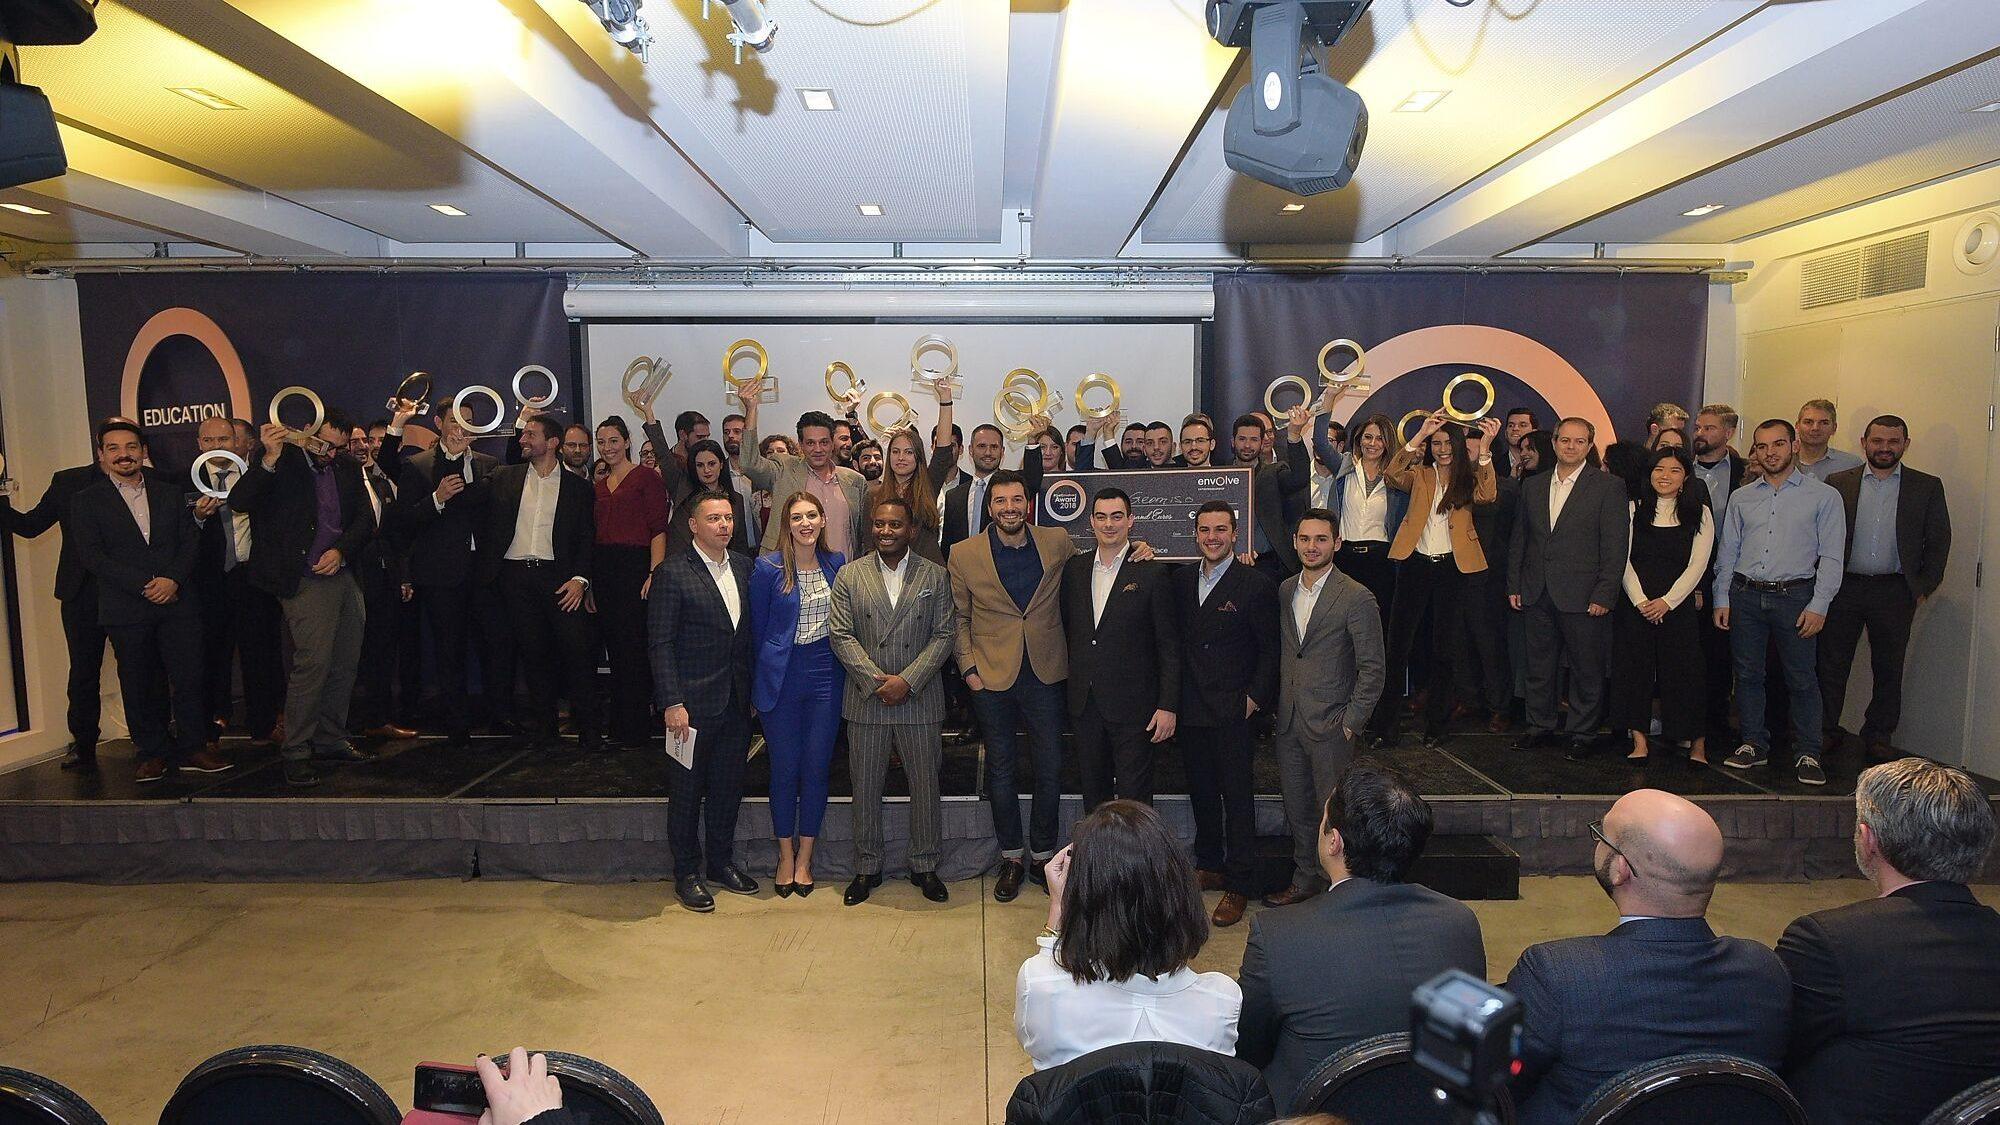 Envolve: Προσκαλεί νεοφυείς επιχειρήσεις στην Ελλάδα να συμμετάσχουν στο 7ο Envolve Award Greece